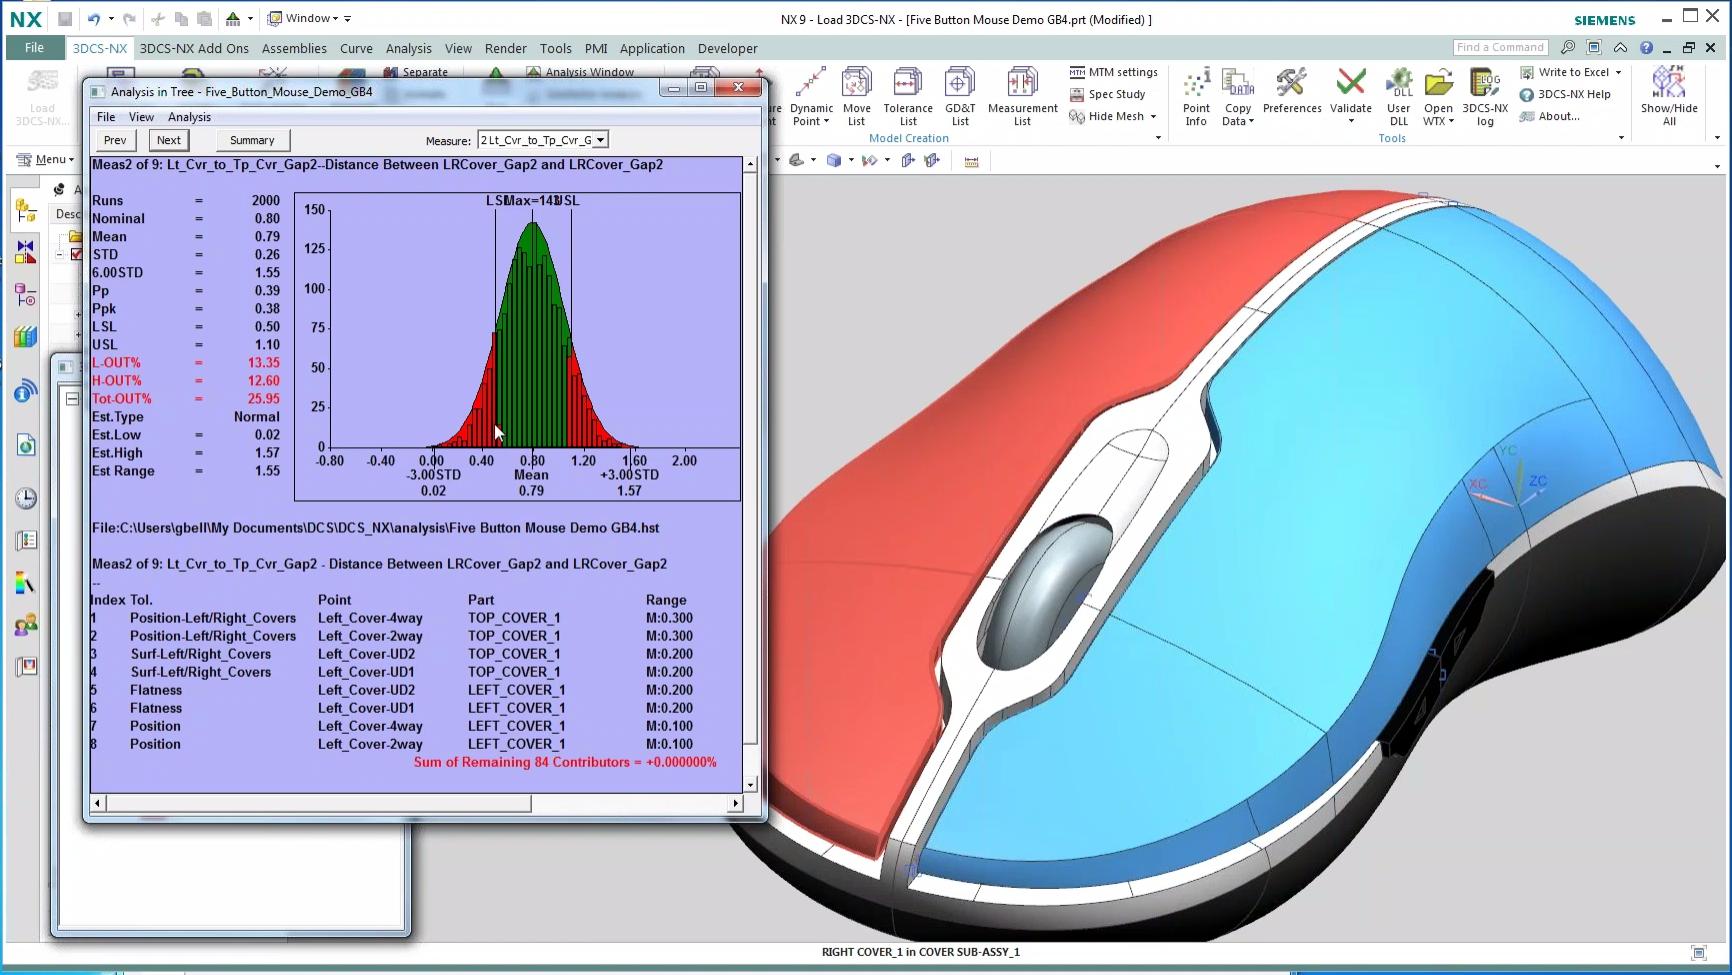 3dcs-nx-mouse-tolerance-analysis-contributorsa